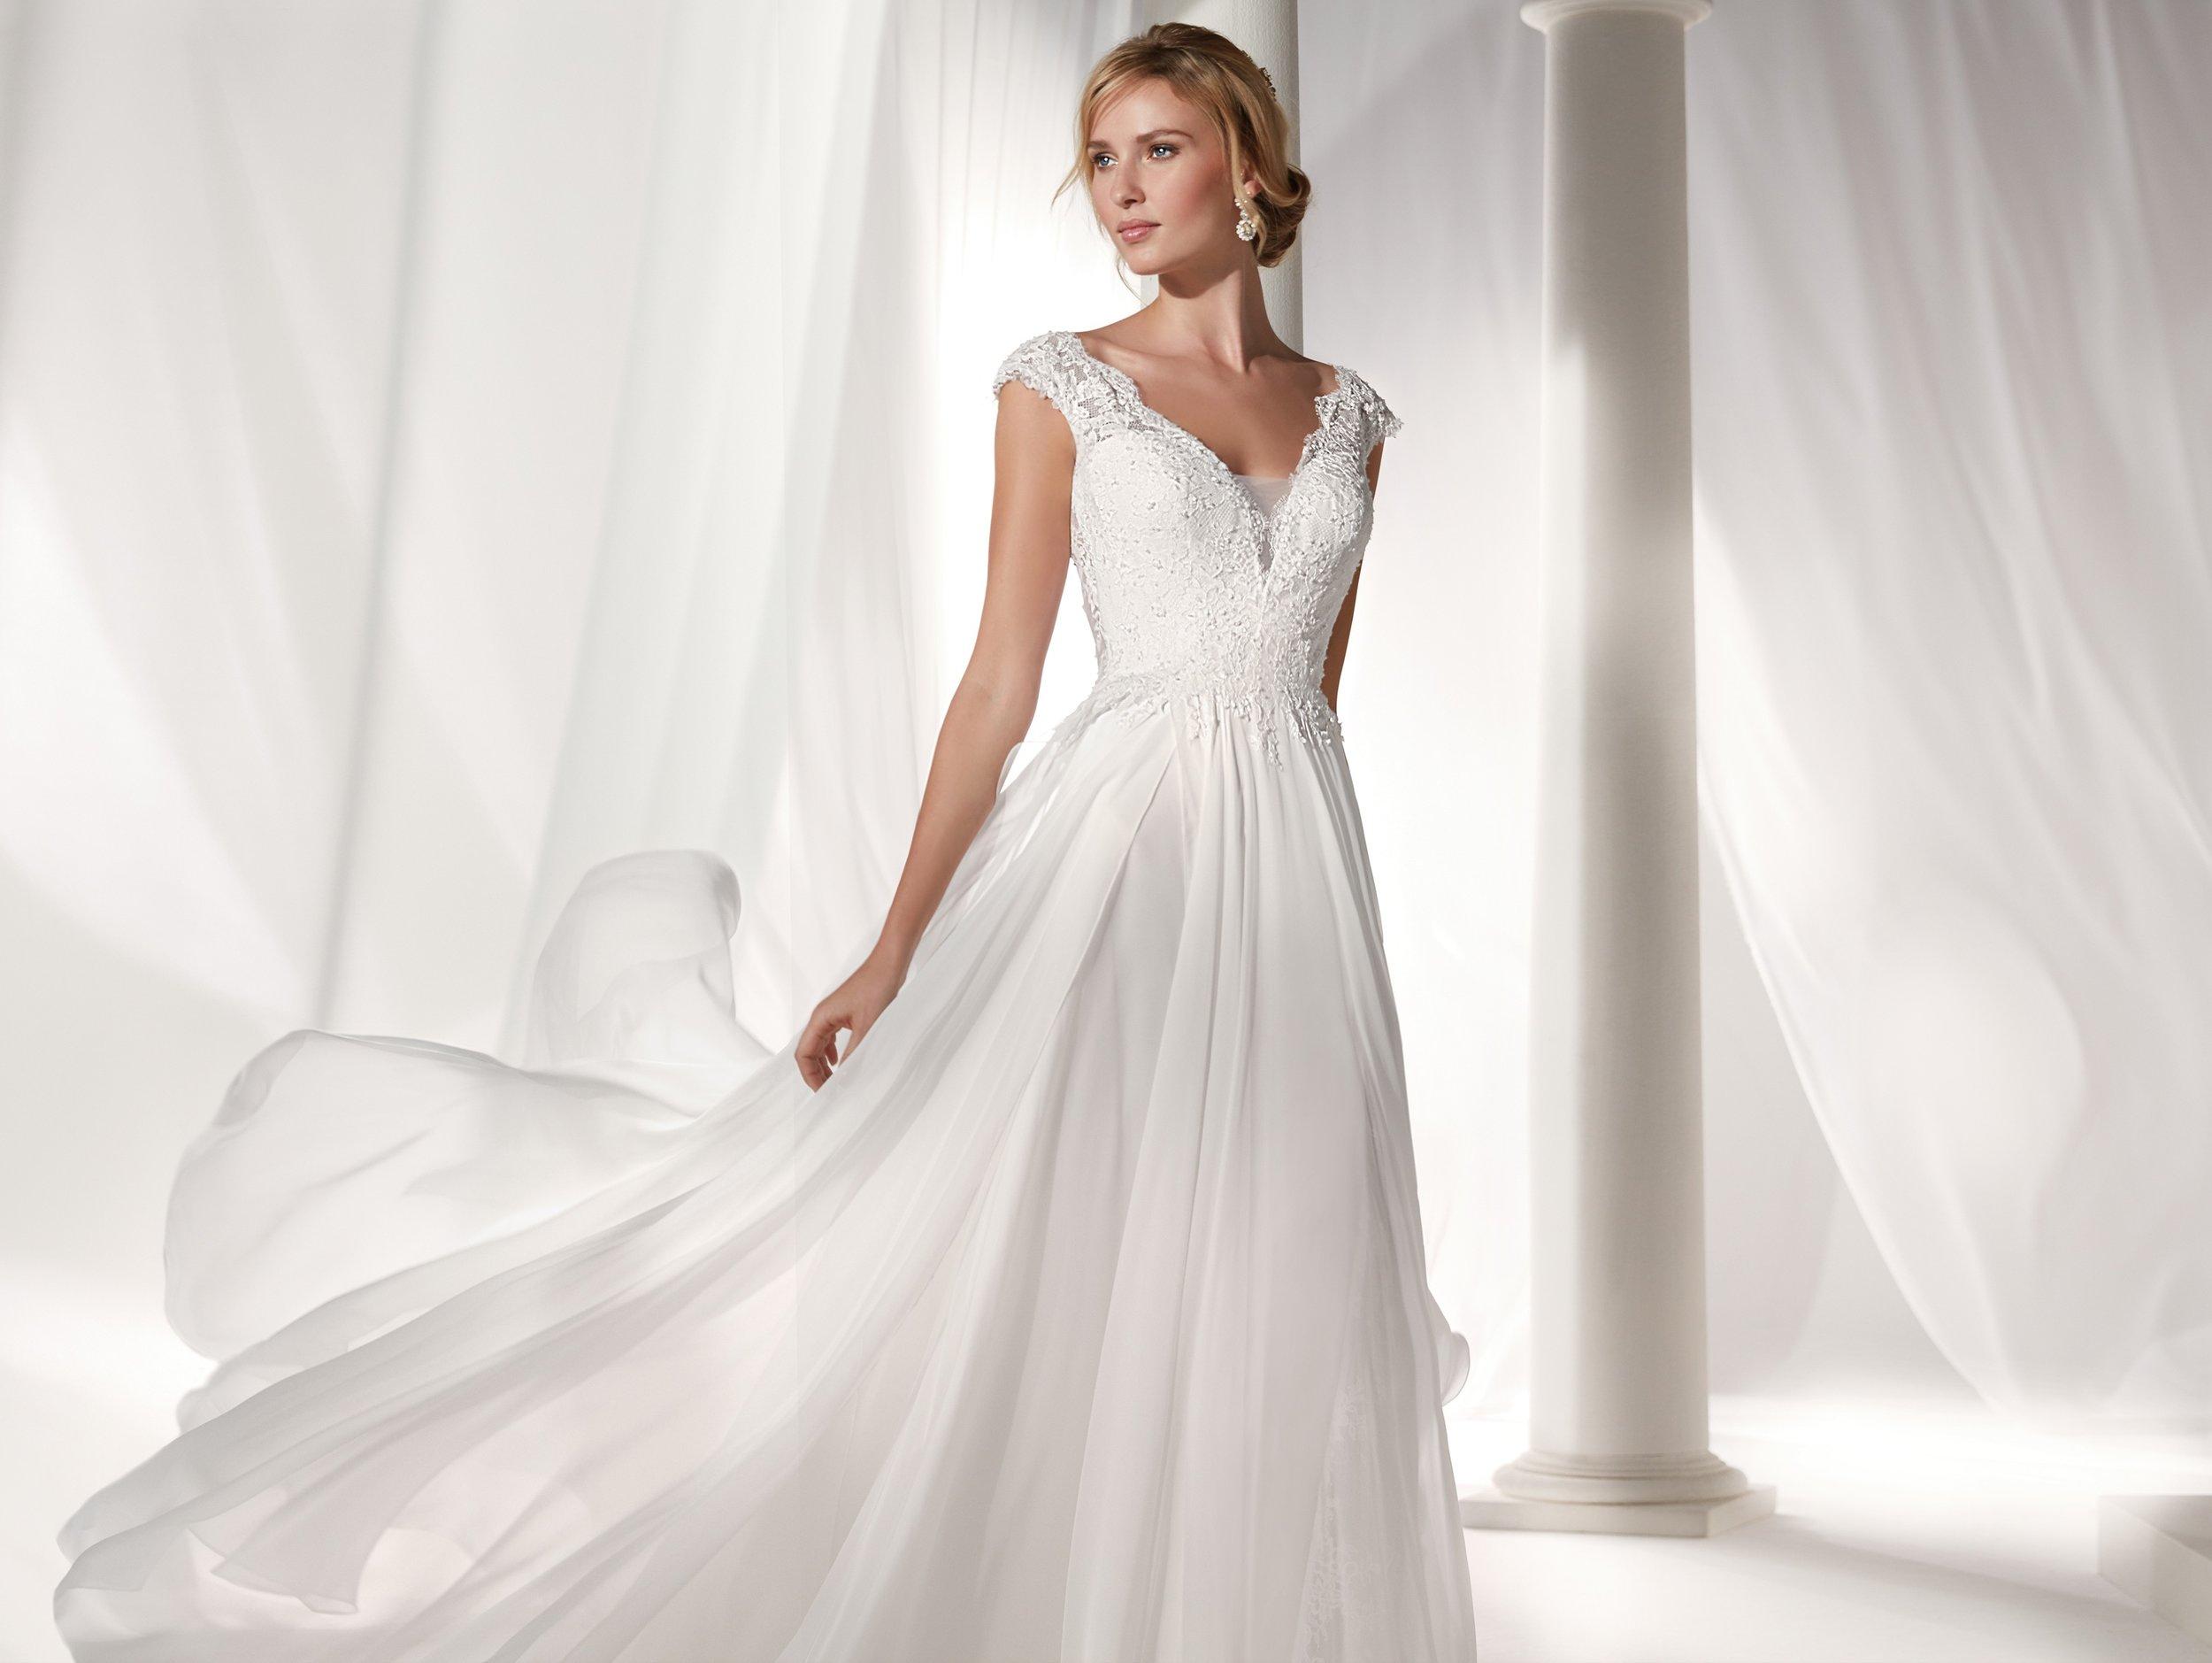 nicole-spose-NIAB19012-Nicole-moda-sposa-2019-74.jpg